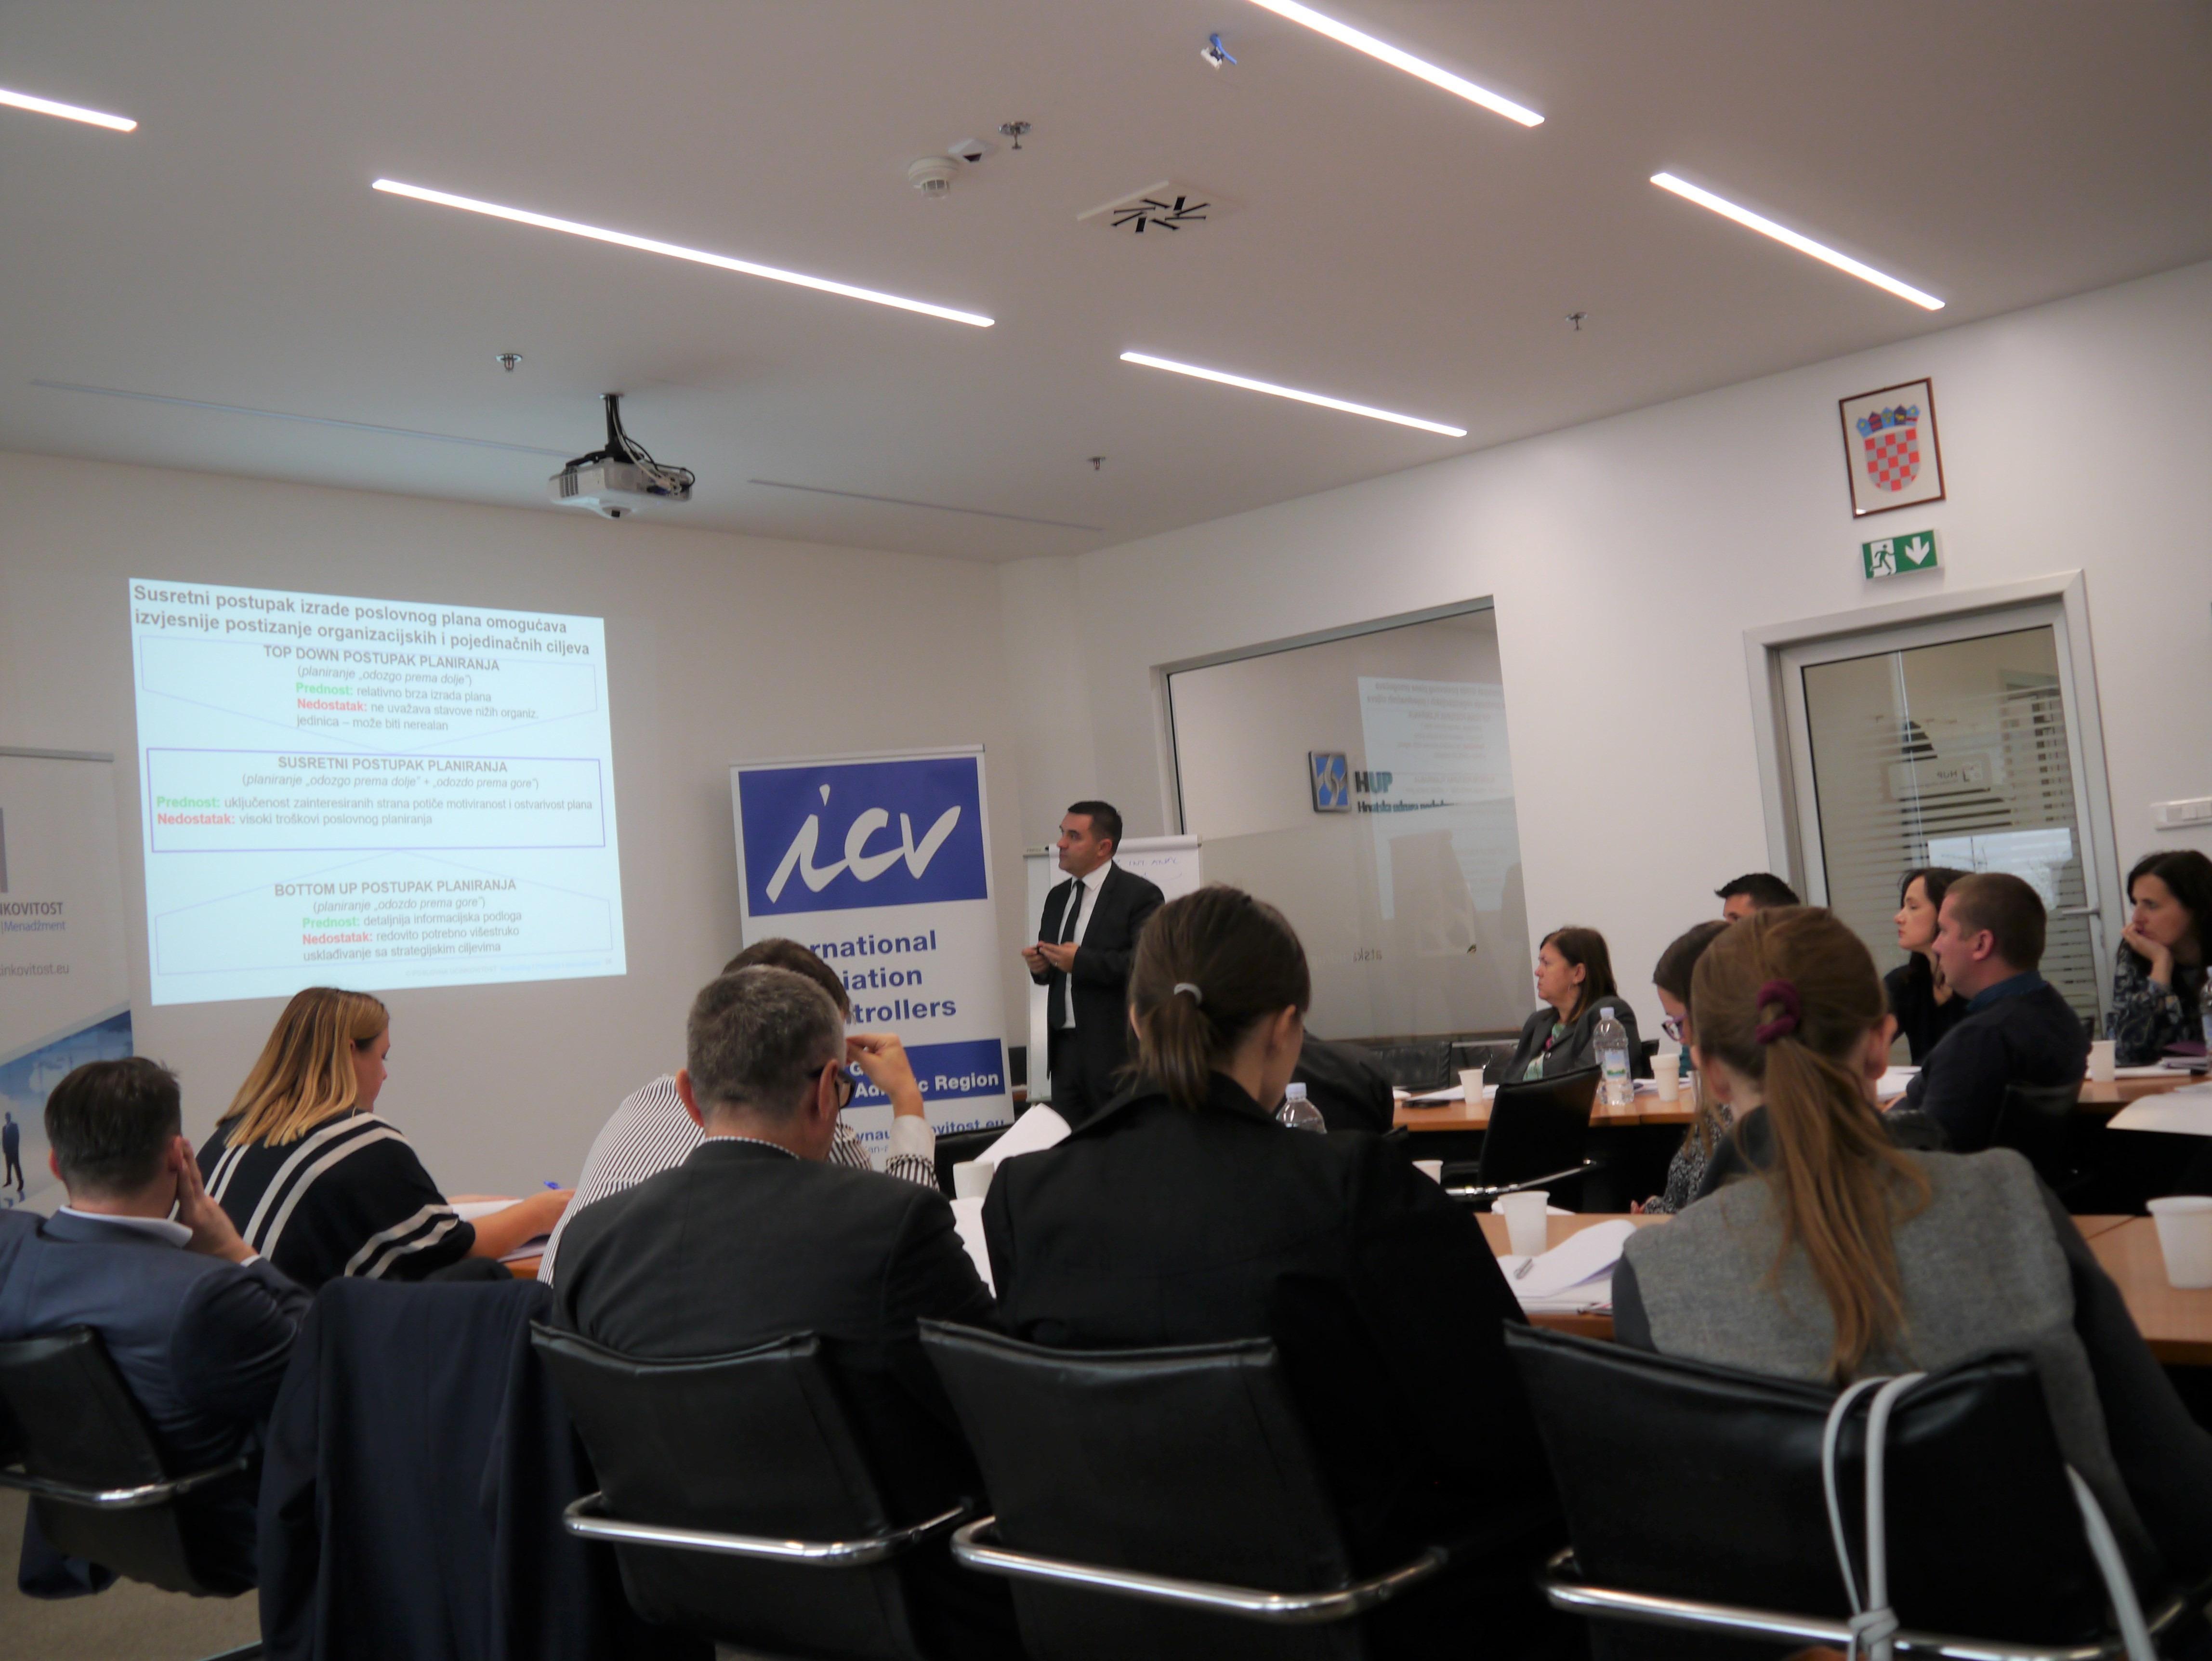 Uspješno održana edukacija i 5. ICV Croatian Adriatic Region Workshop